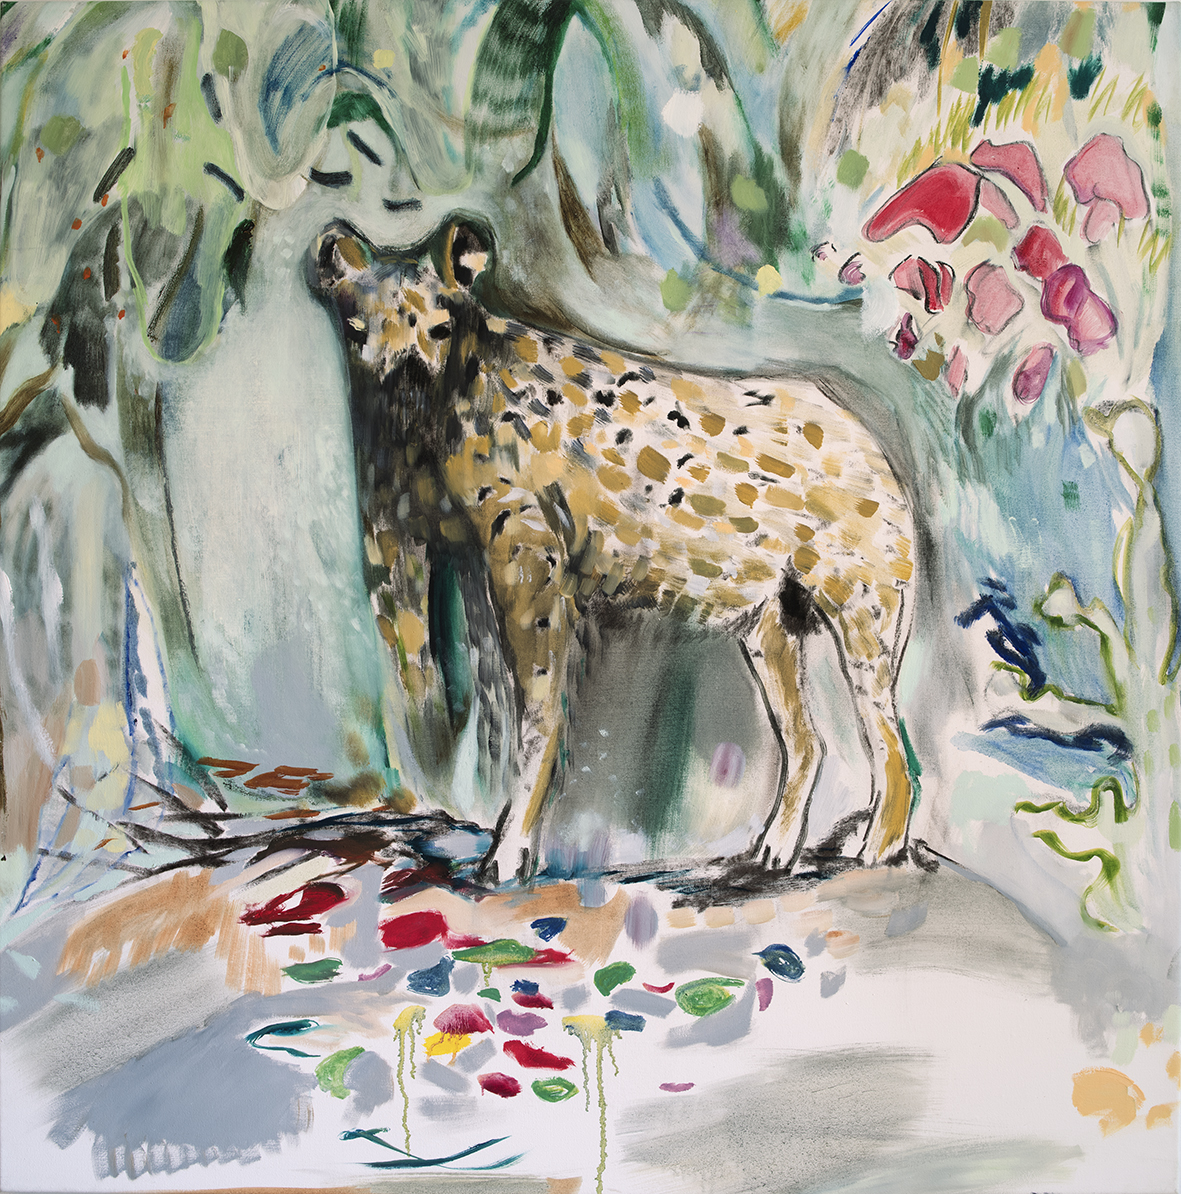 Vera Portatadino, Standing Hyena, 2015, olio su tela, 120 x 120 cm